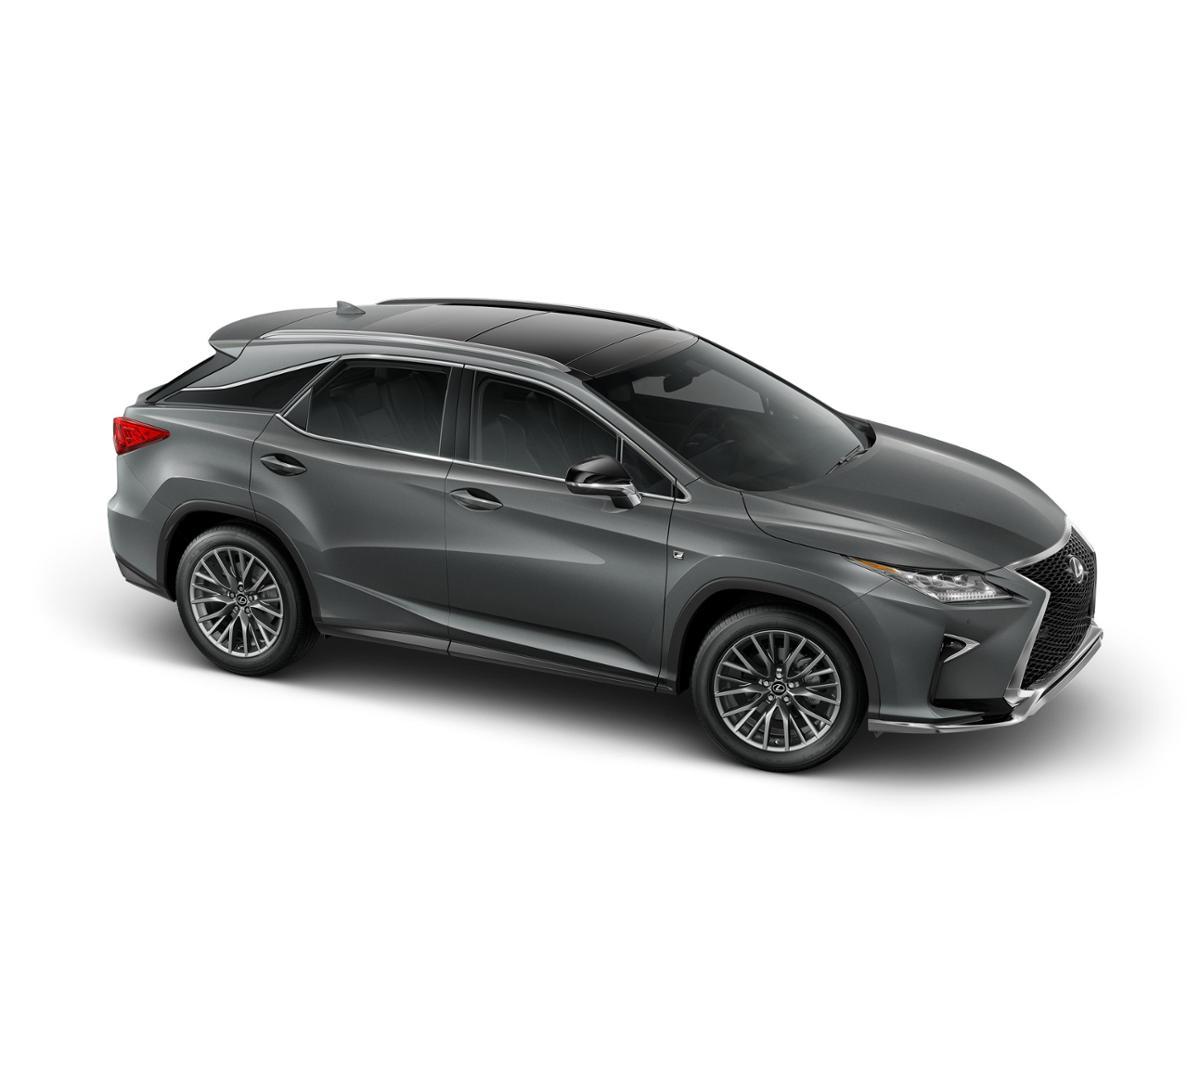 Haldeman Lexus Of Princeton Lexus Sales In Princeton Nj